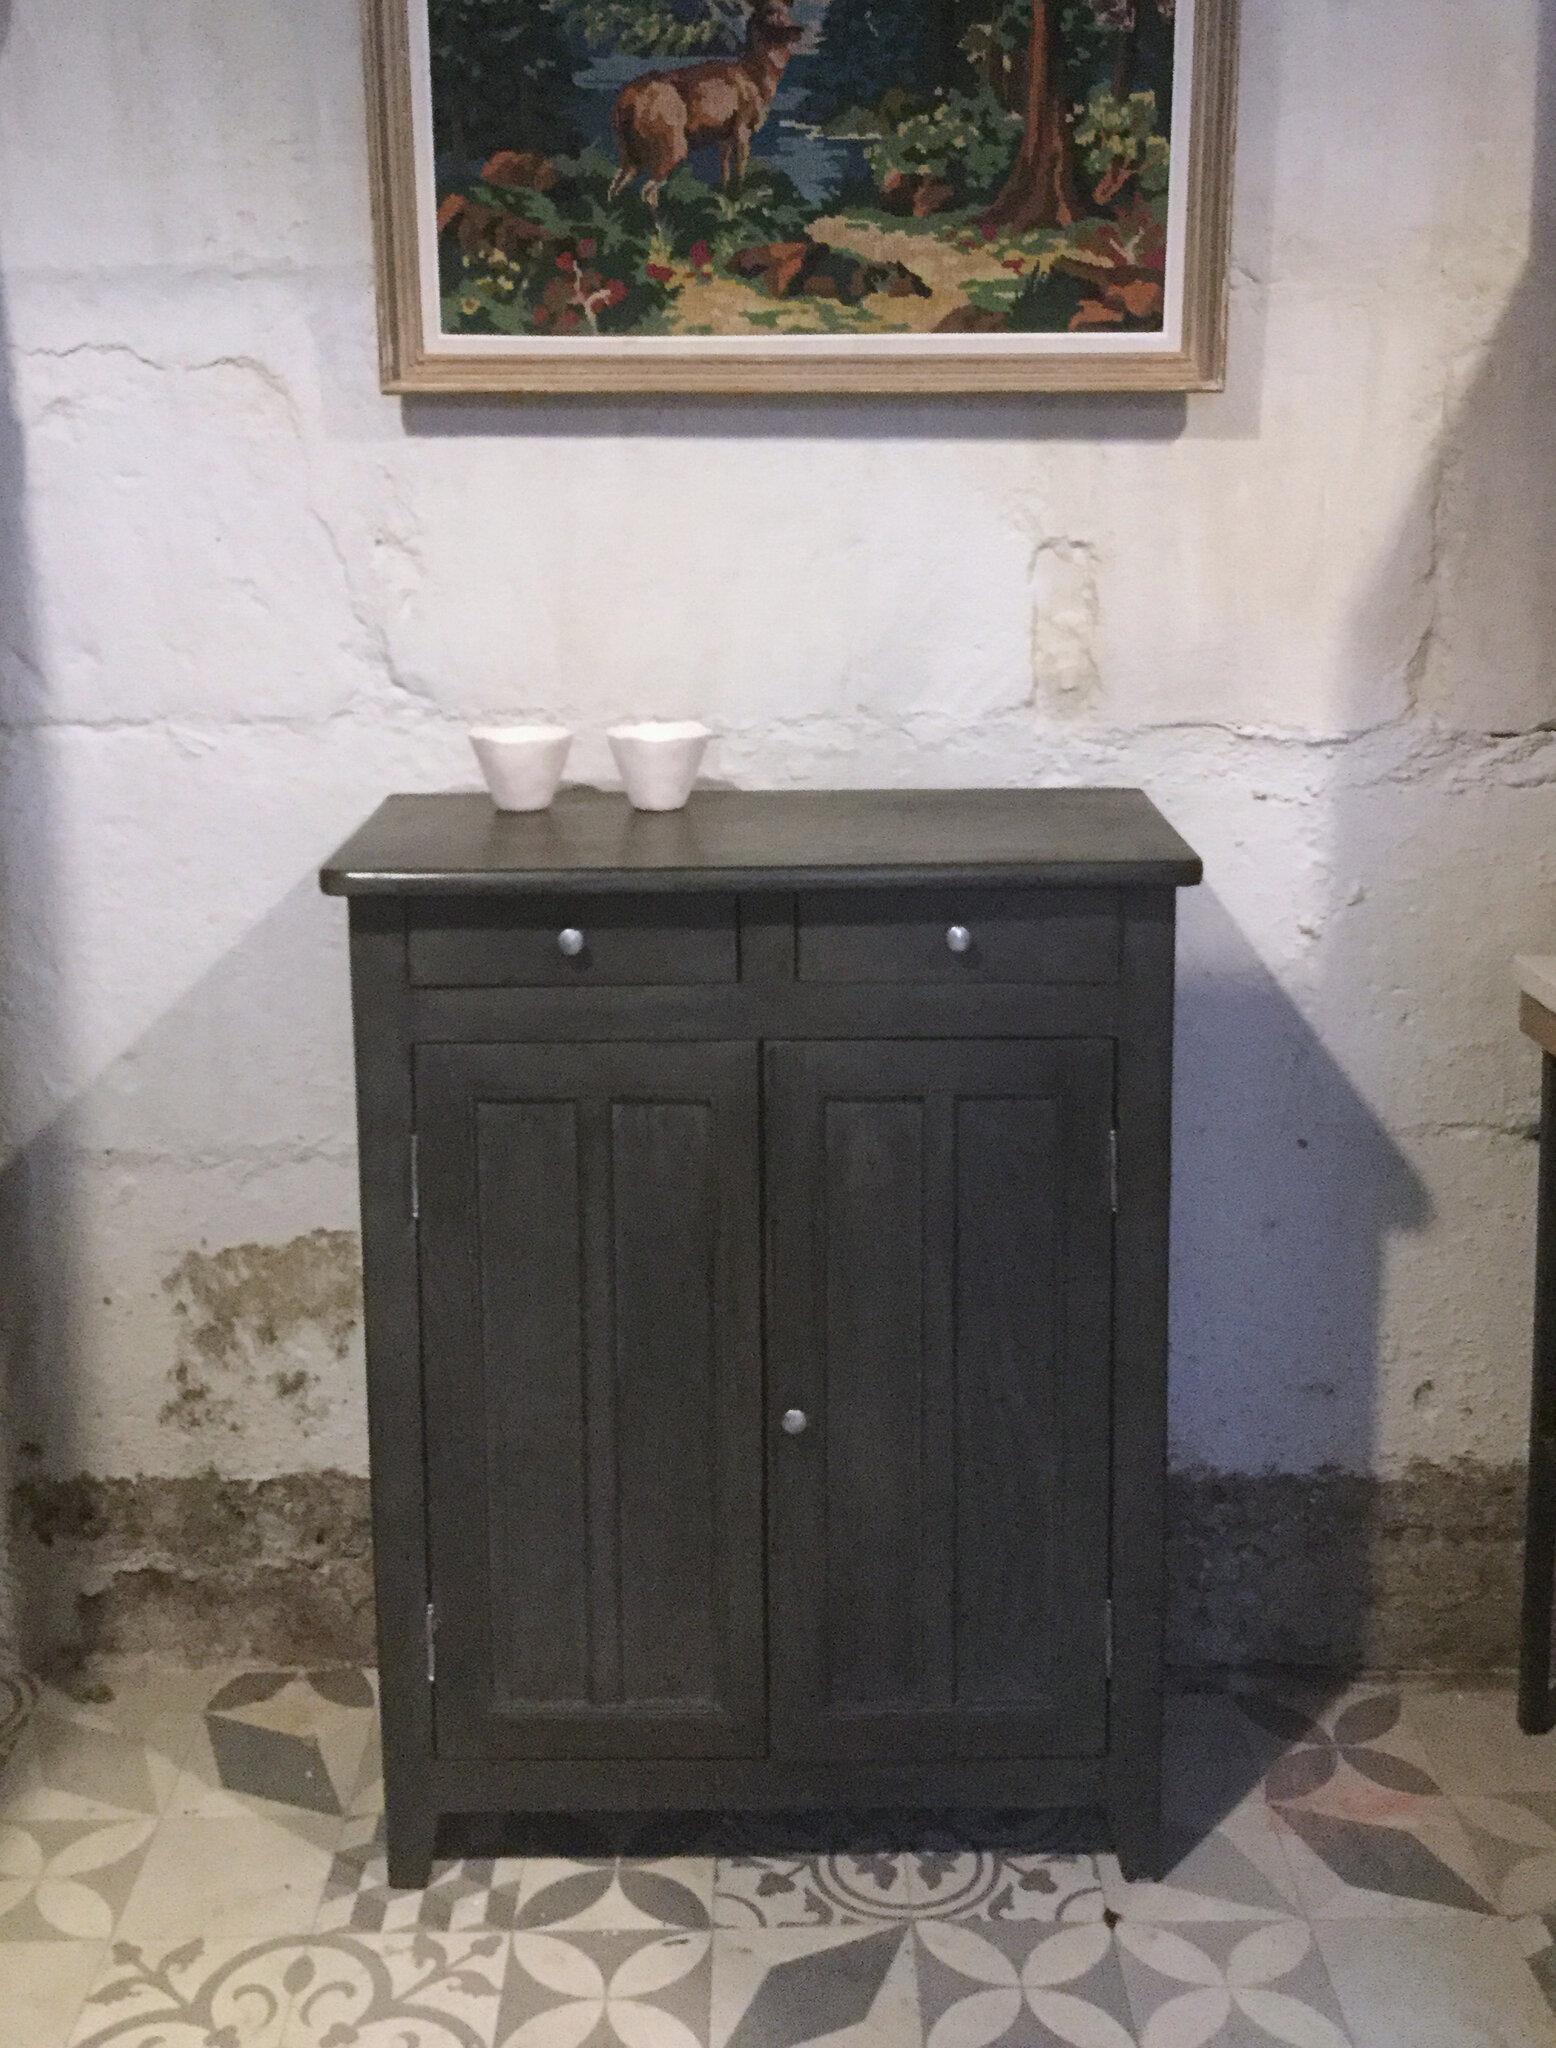 Meuble peint patin petit tuto pour patiner vos meubles - Patiner un meuble peint ...